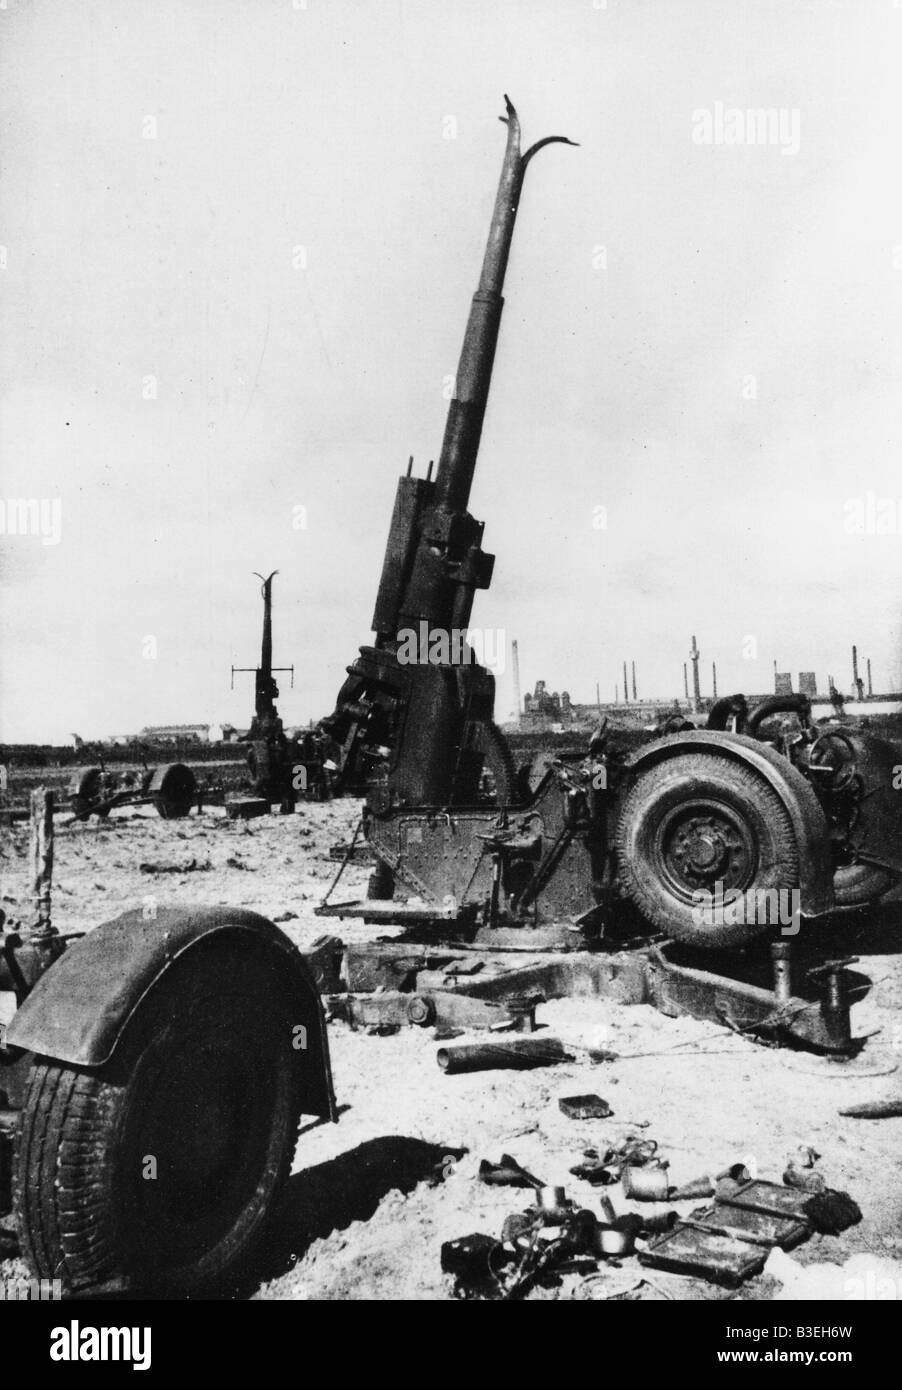 World War II/Western Offensive. - Stock Image